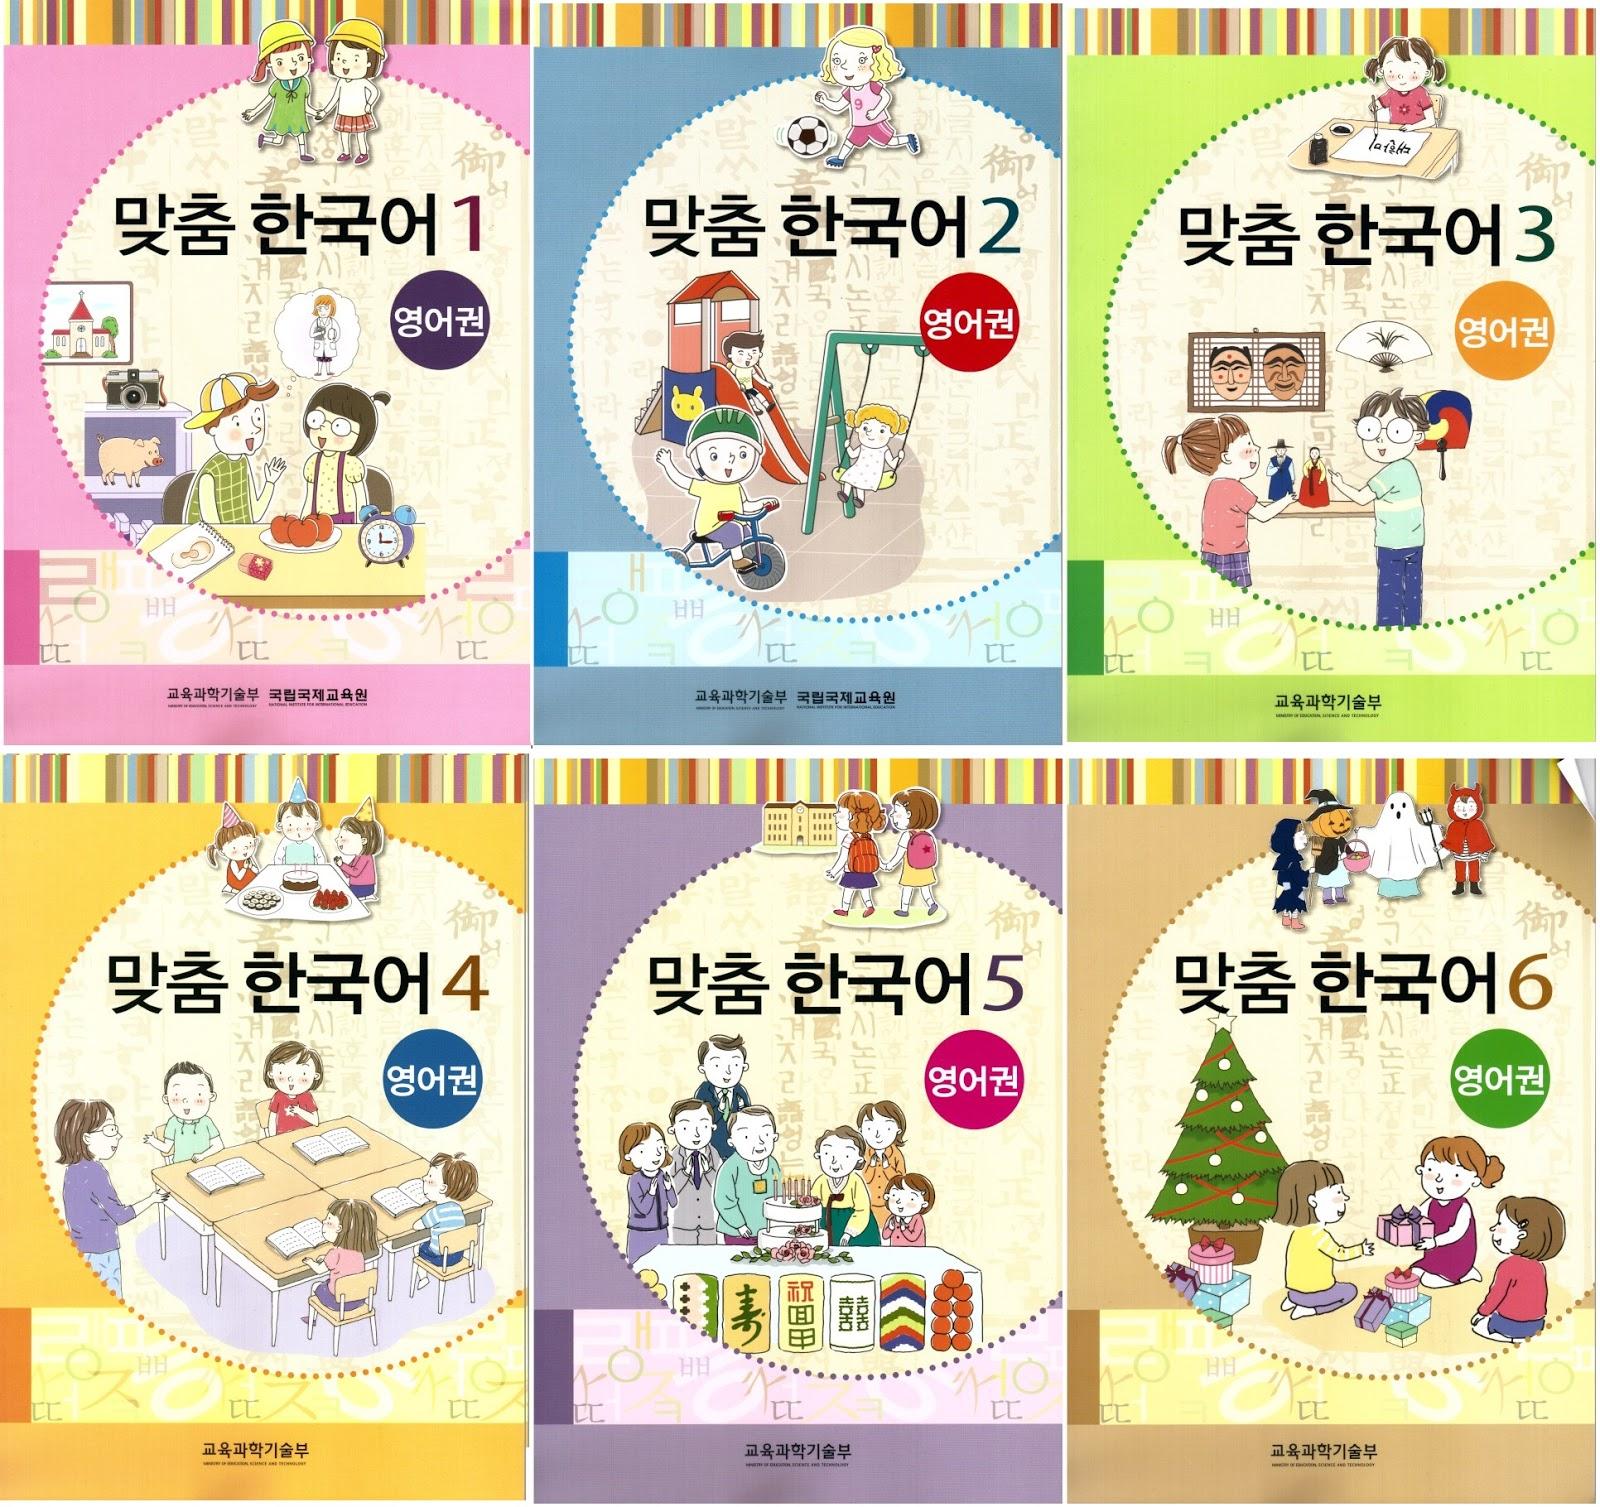 Workbooks - How to study Korean